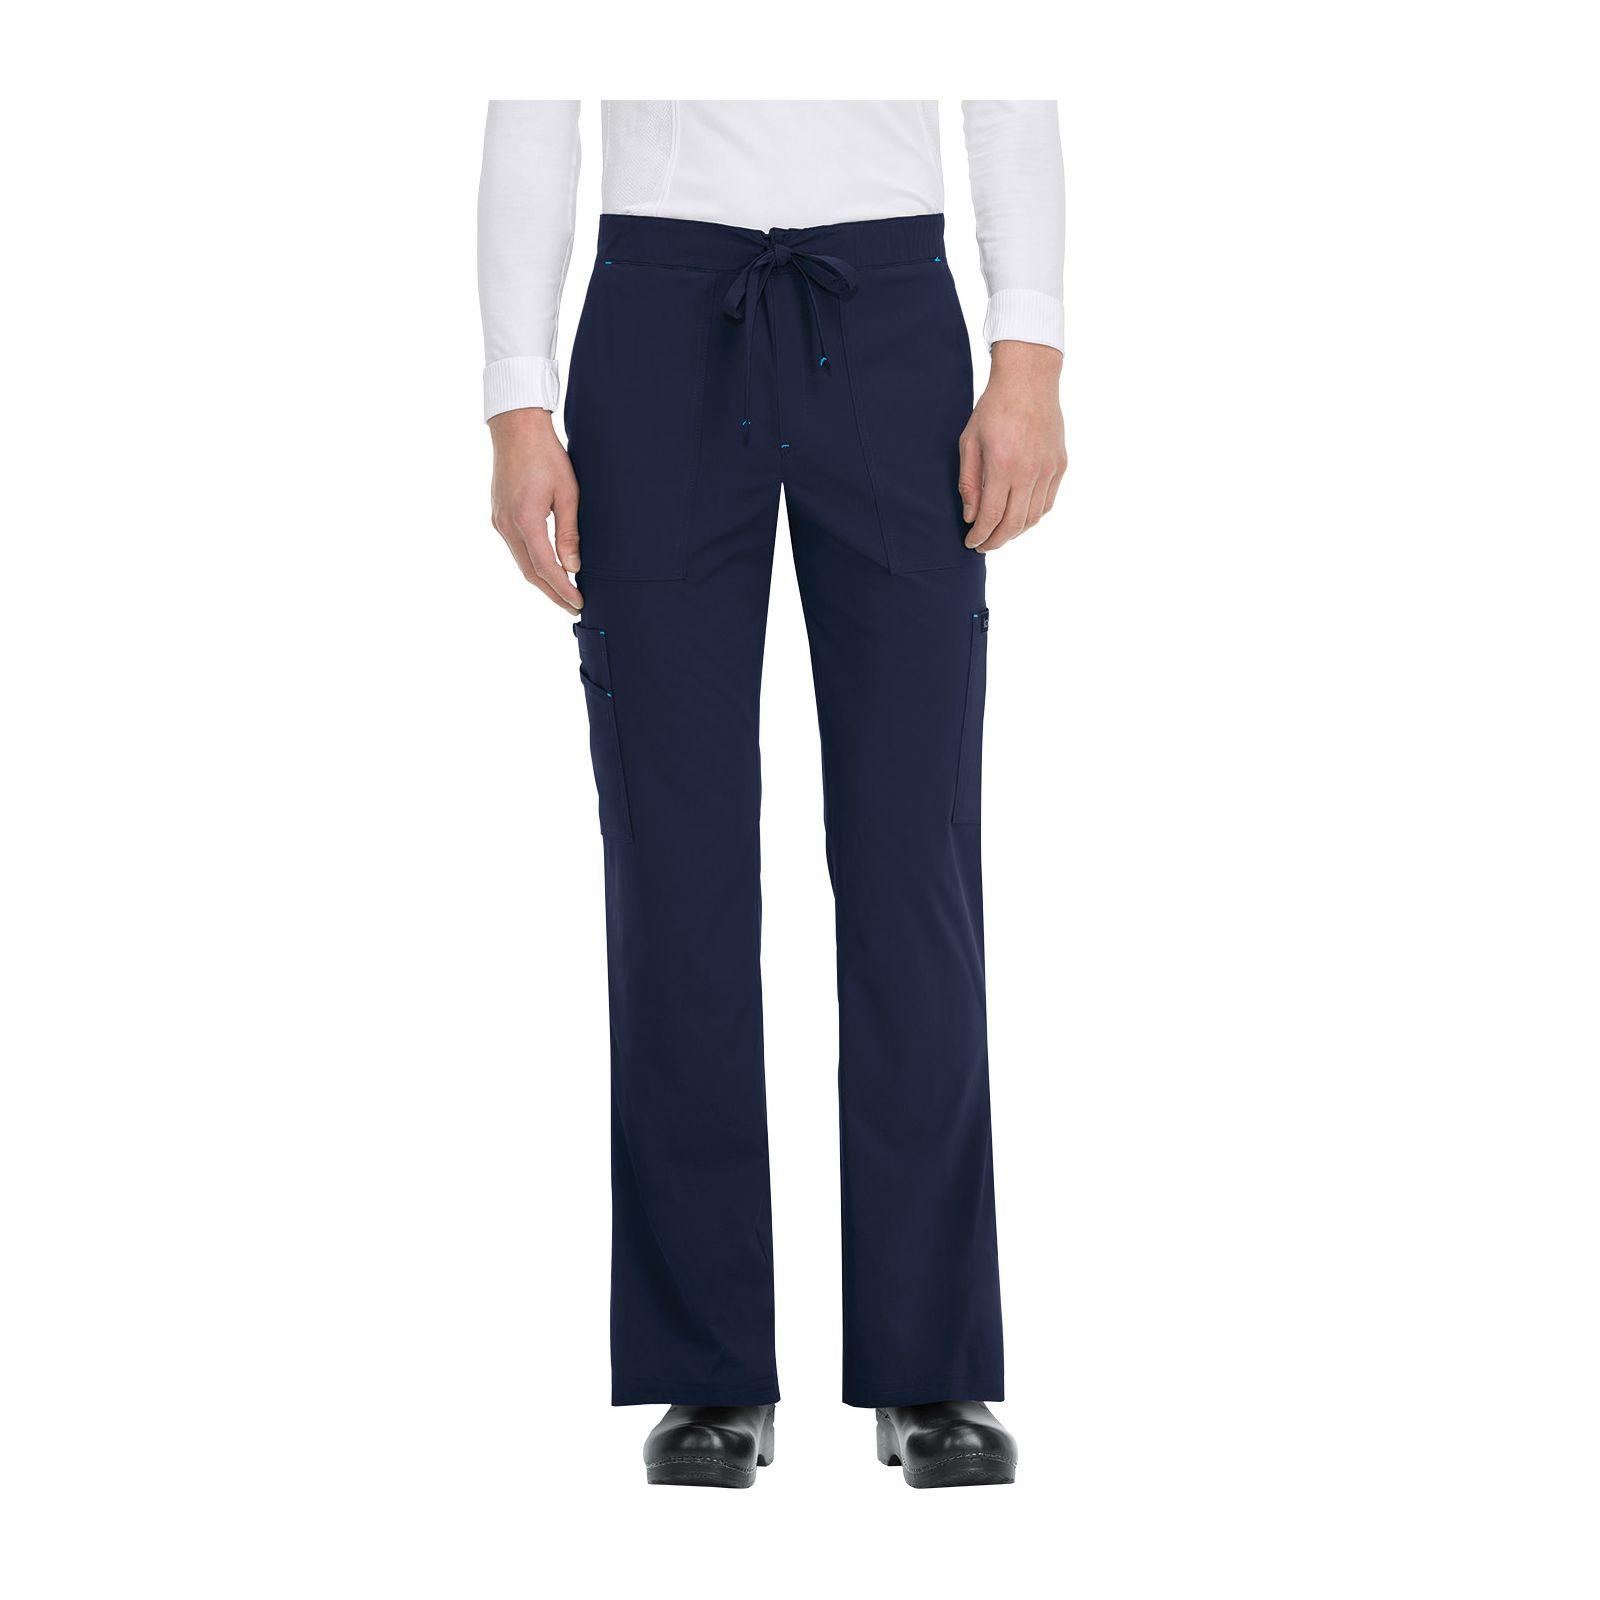 "Pantalon médical Homme Koi ""Luke"", collection ""Koi Basics"" (605-) bleu marine face"